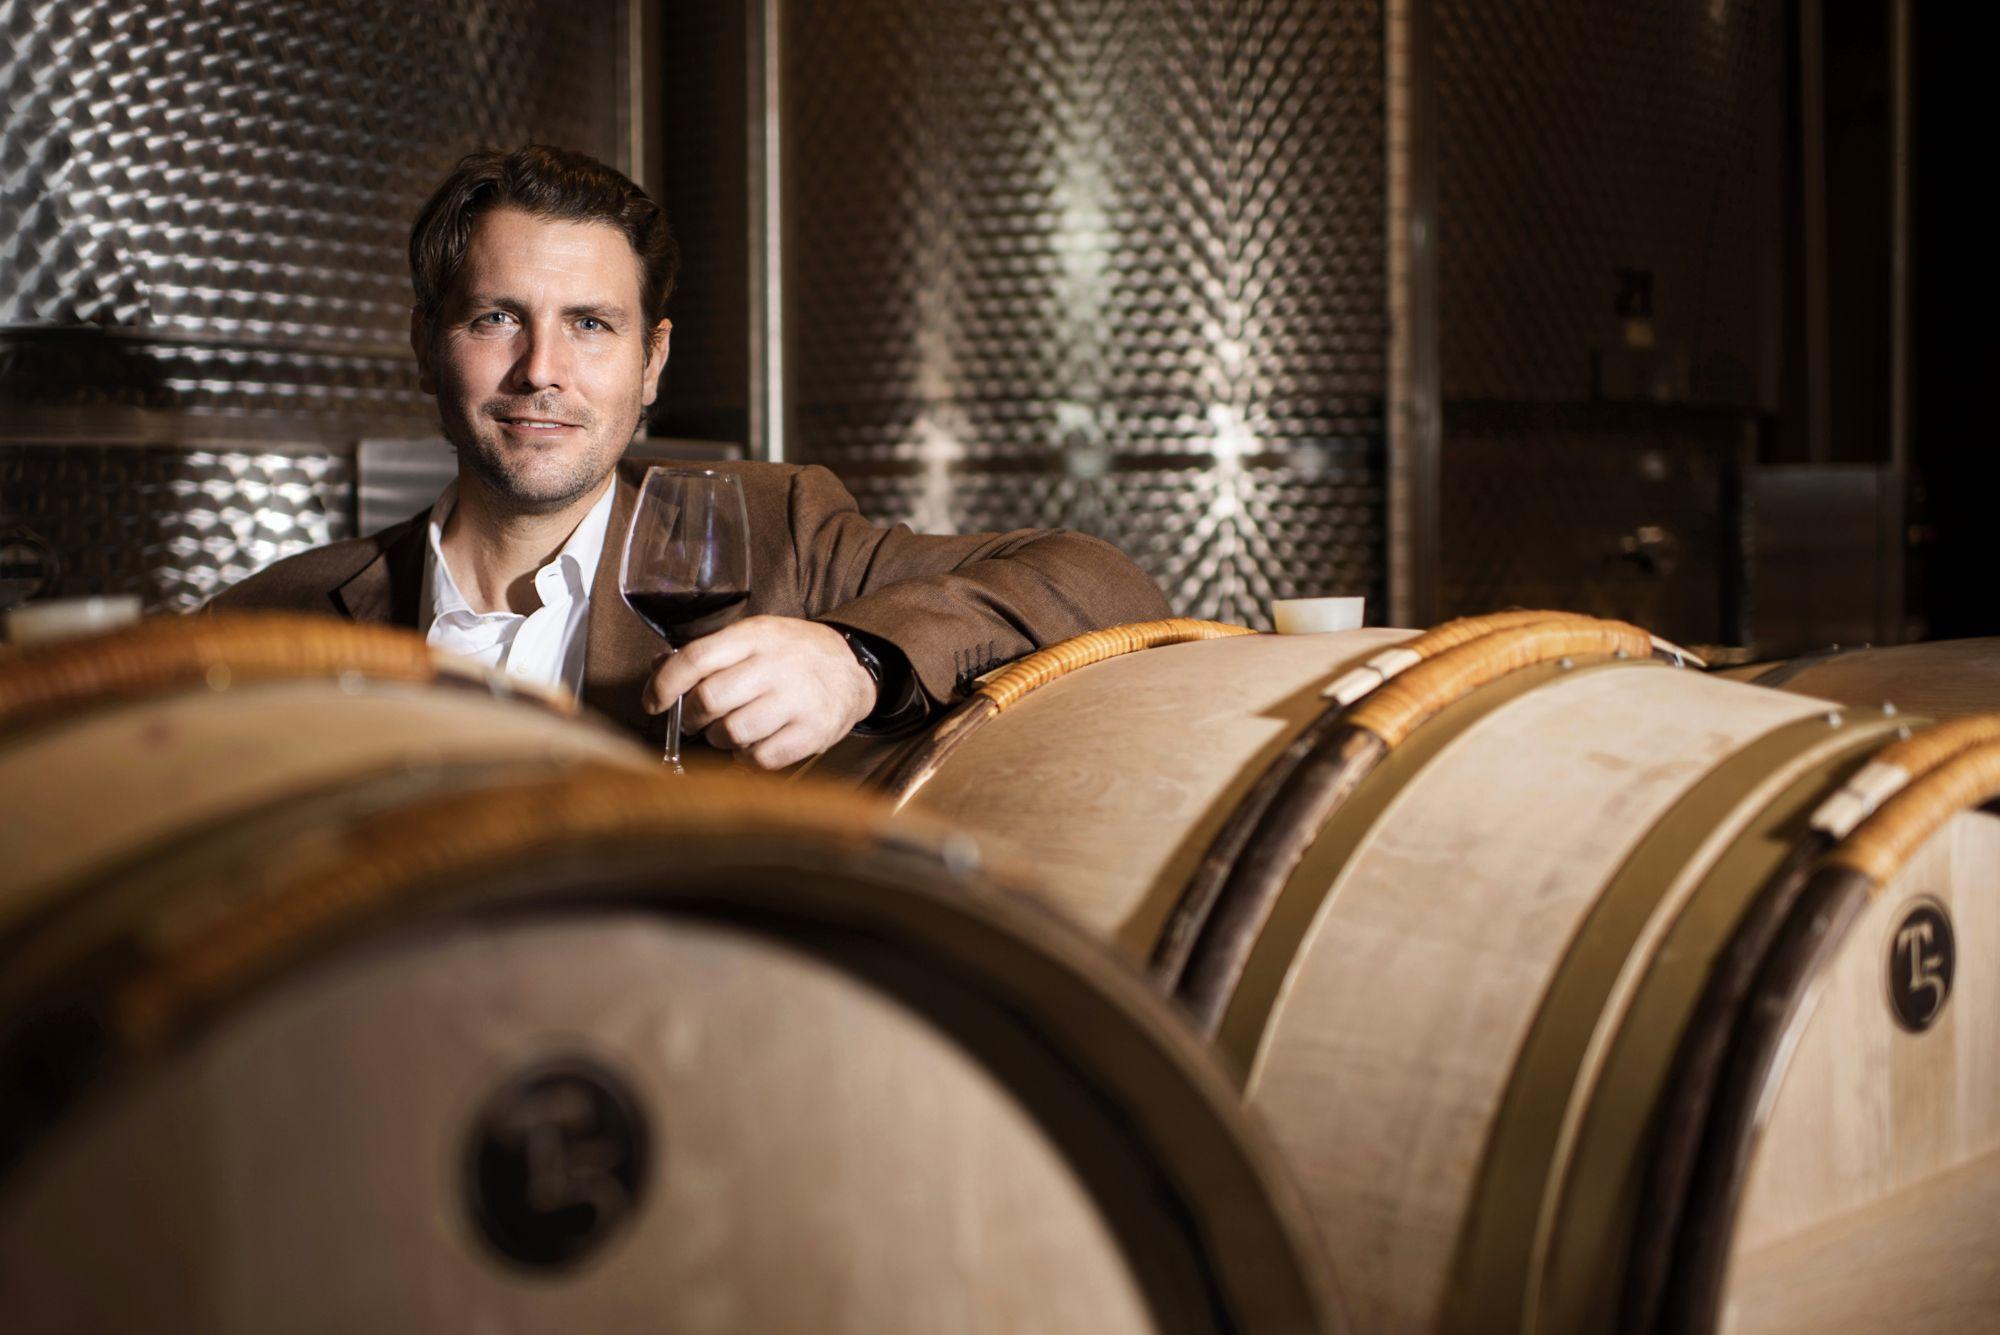 Salvatore Ferragamo, CEO of Il Borro, posing in between handmade wine barrels.